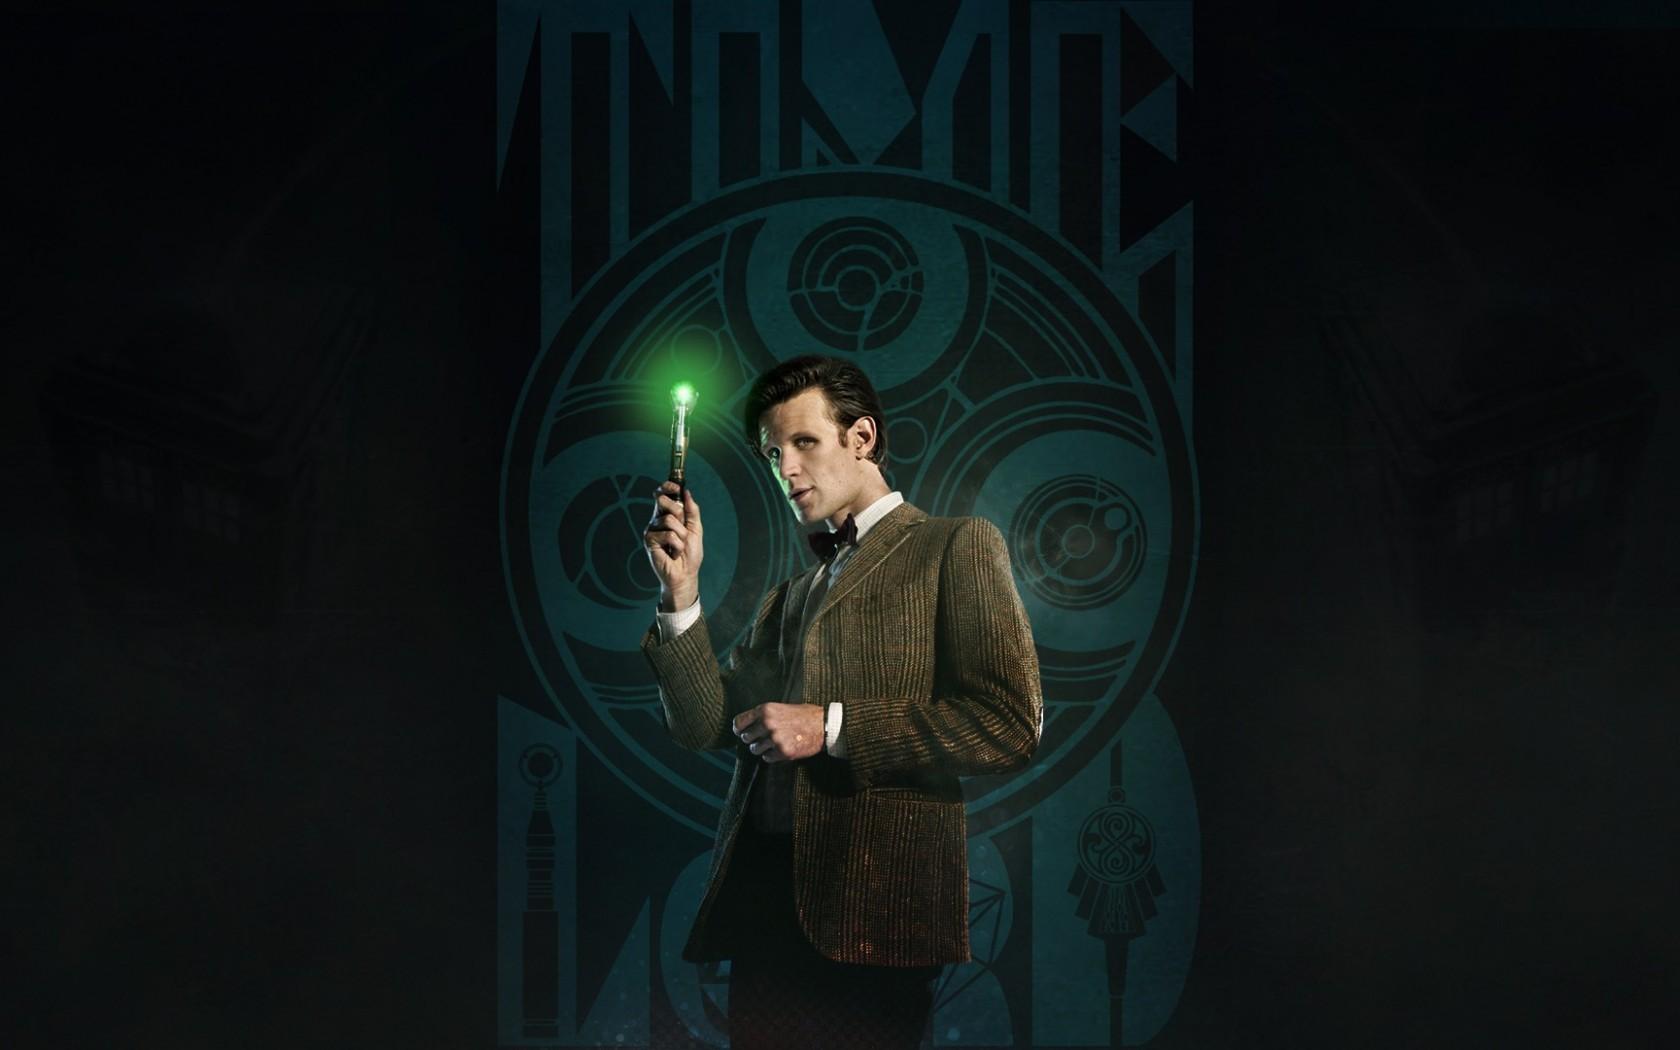 Wallpaper Doctor Who Midnight Eleventh Doctor Matt Smith